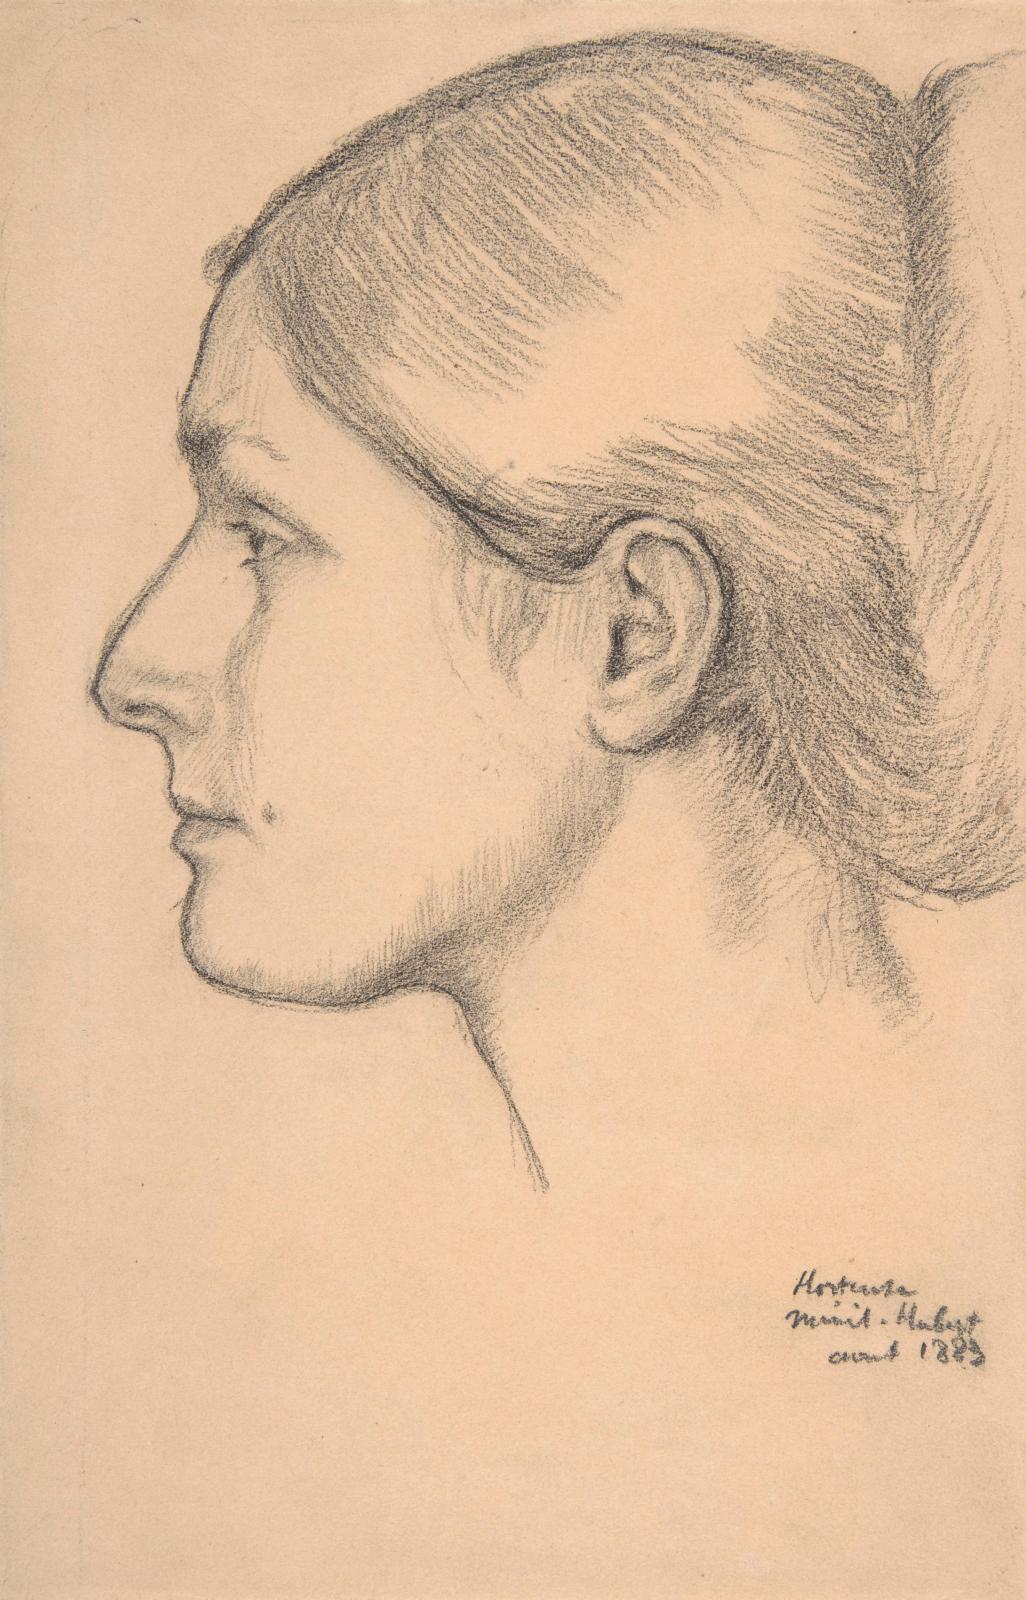 Edgar Degas (1834-1917), Portrait of Hortense Valpinçon (Mme. Jacques Fourchy), 1883, pencil on paper, 25 x 16.3 cm (9.85 x 6.42 in), New